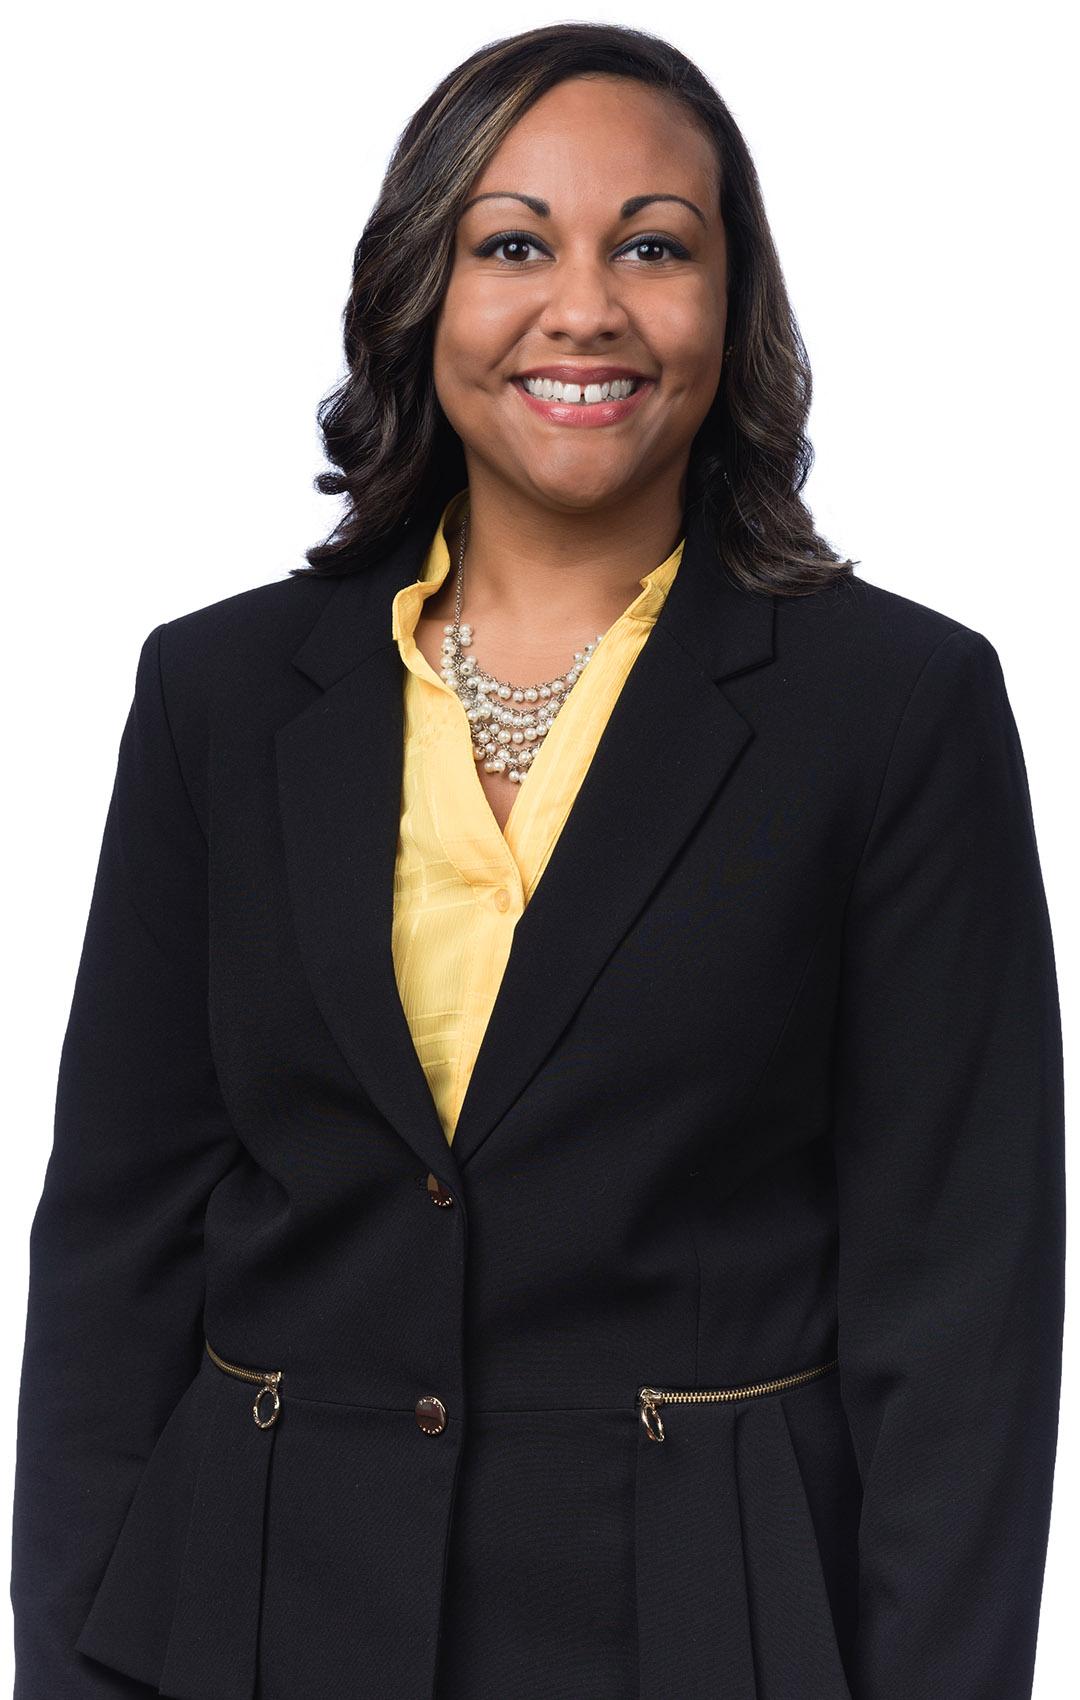 Bethany R. Barclay-Adeniyi